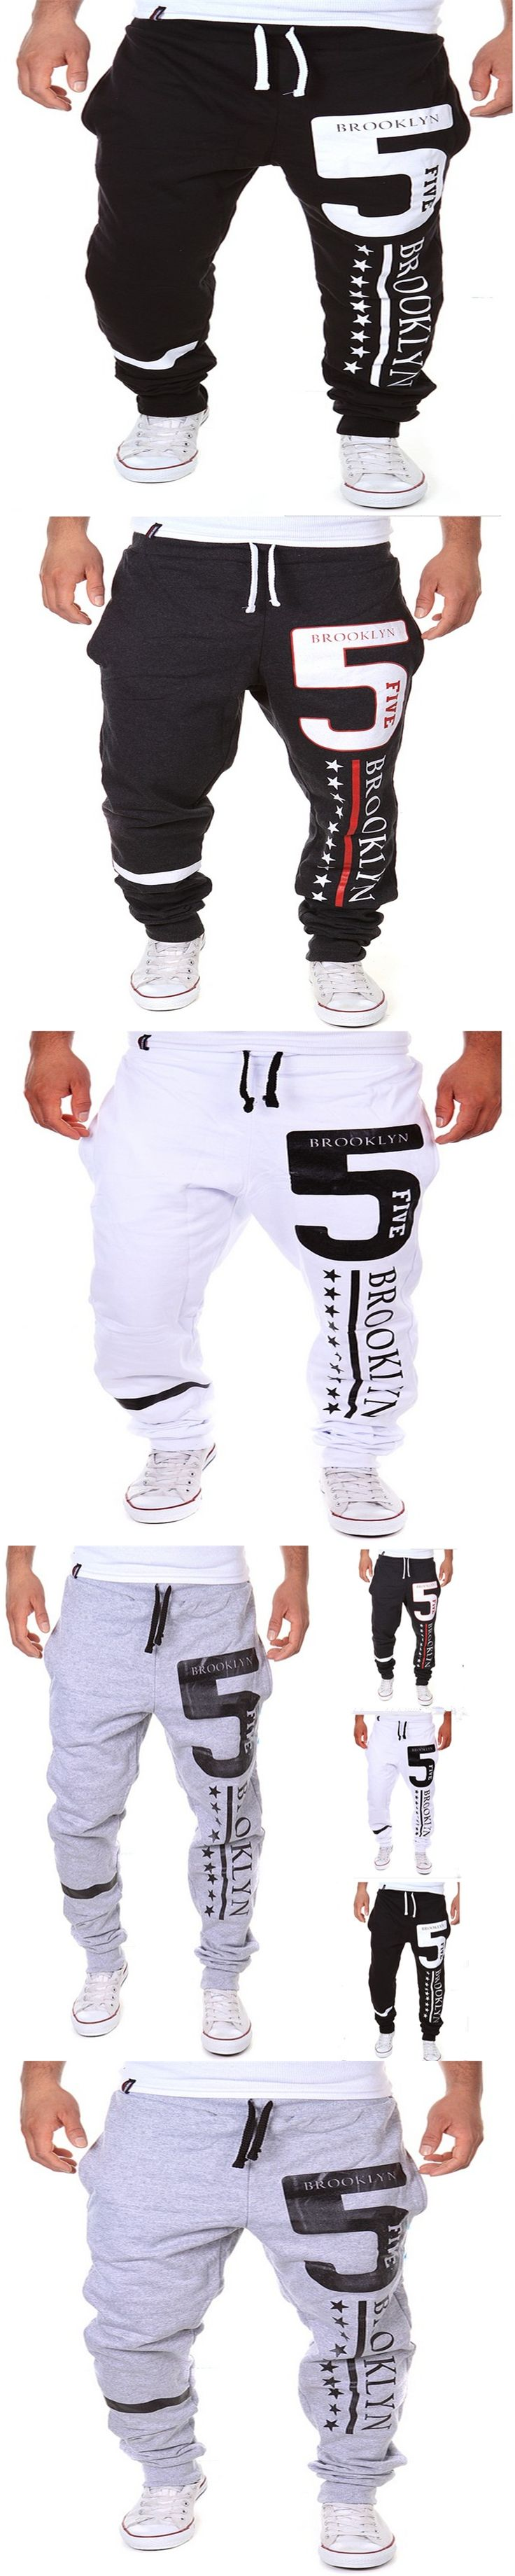 2016 Beswlz New Men's Brand Slim Ankle-Length Pants The Letter Straight Casual Pants Cotton Male Pants Pantalones Hombre